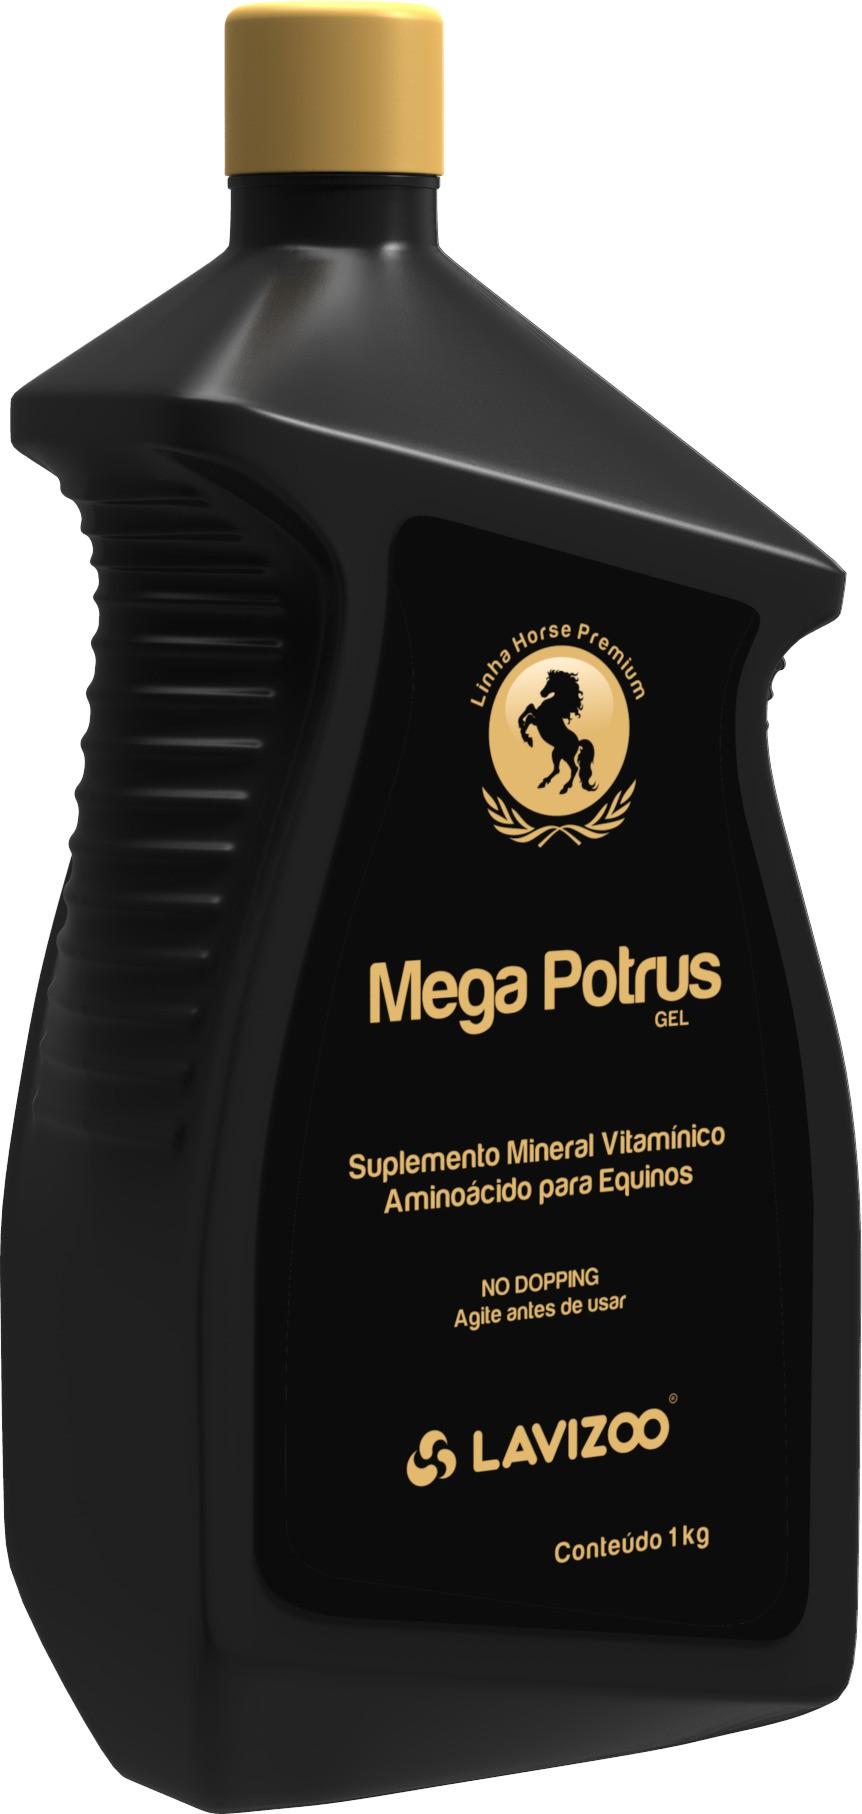 Mega Potrus 1L Lavizoo - Linha Premium Suplementação Equina